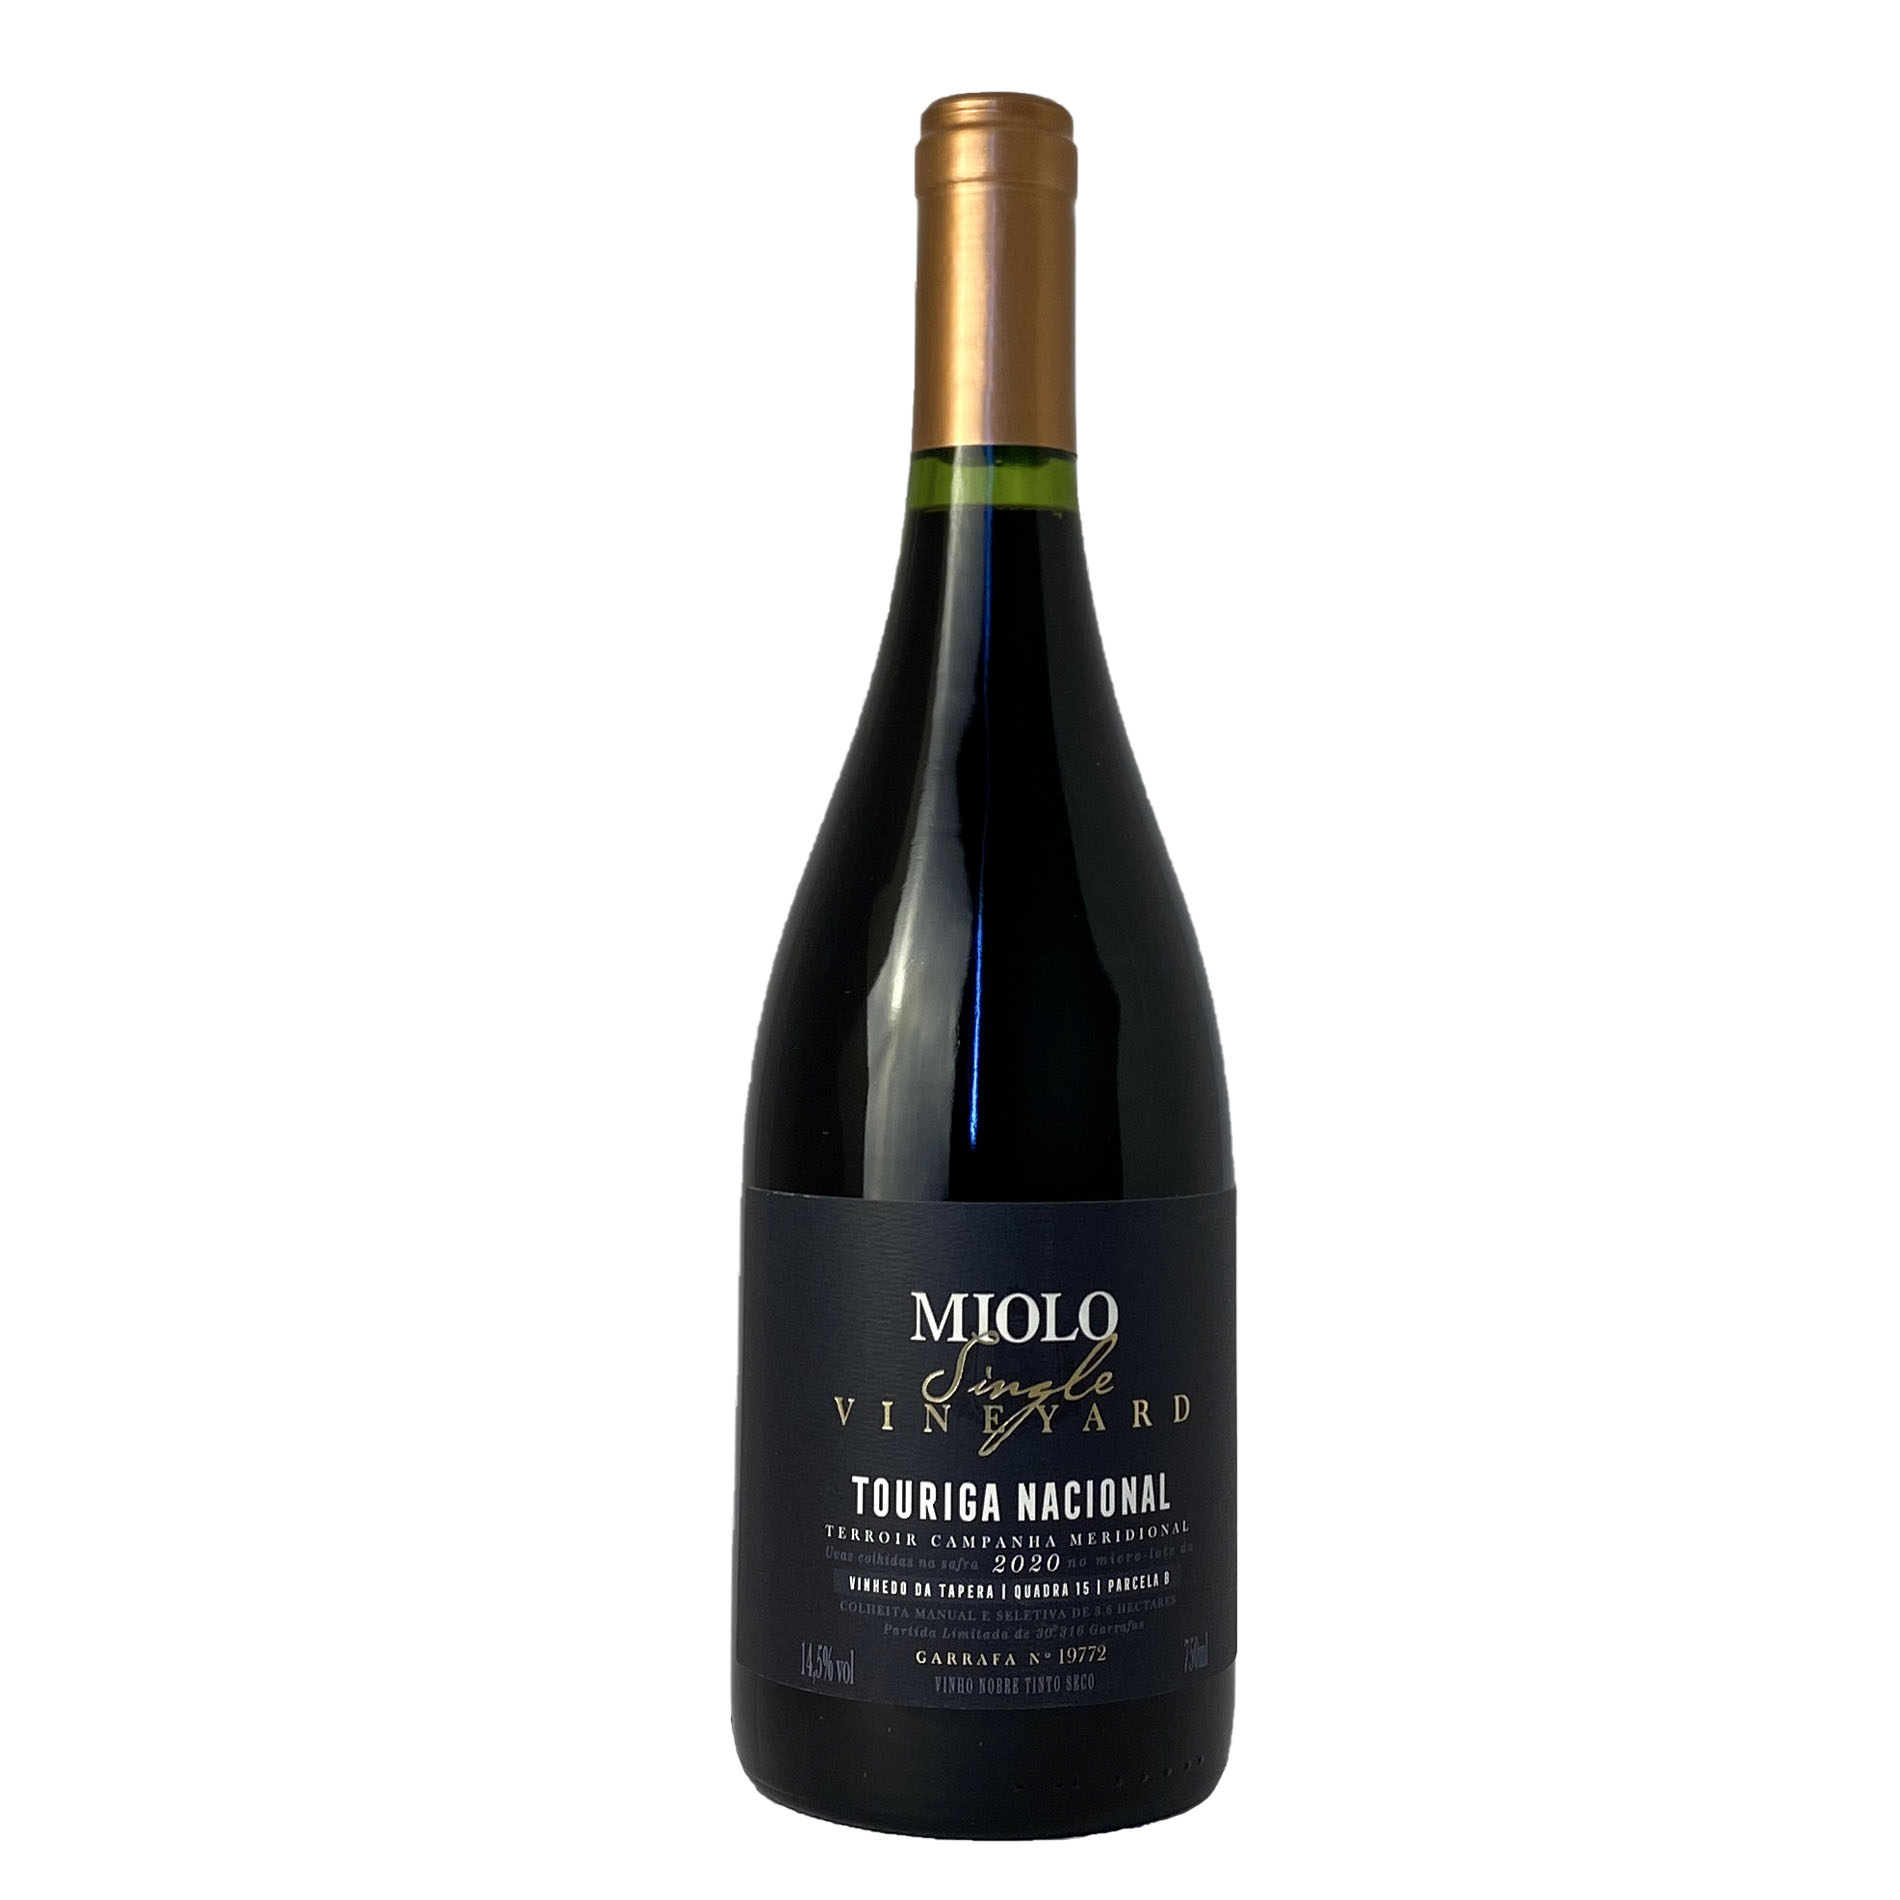 Miolo Single Vineyard Touriga Nacional  - Vinerize